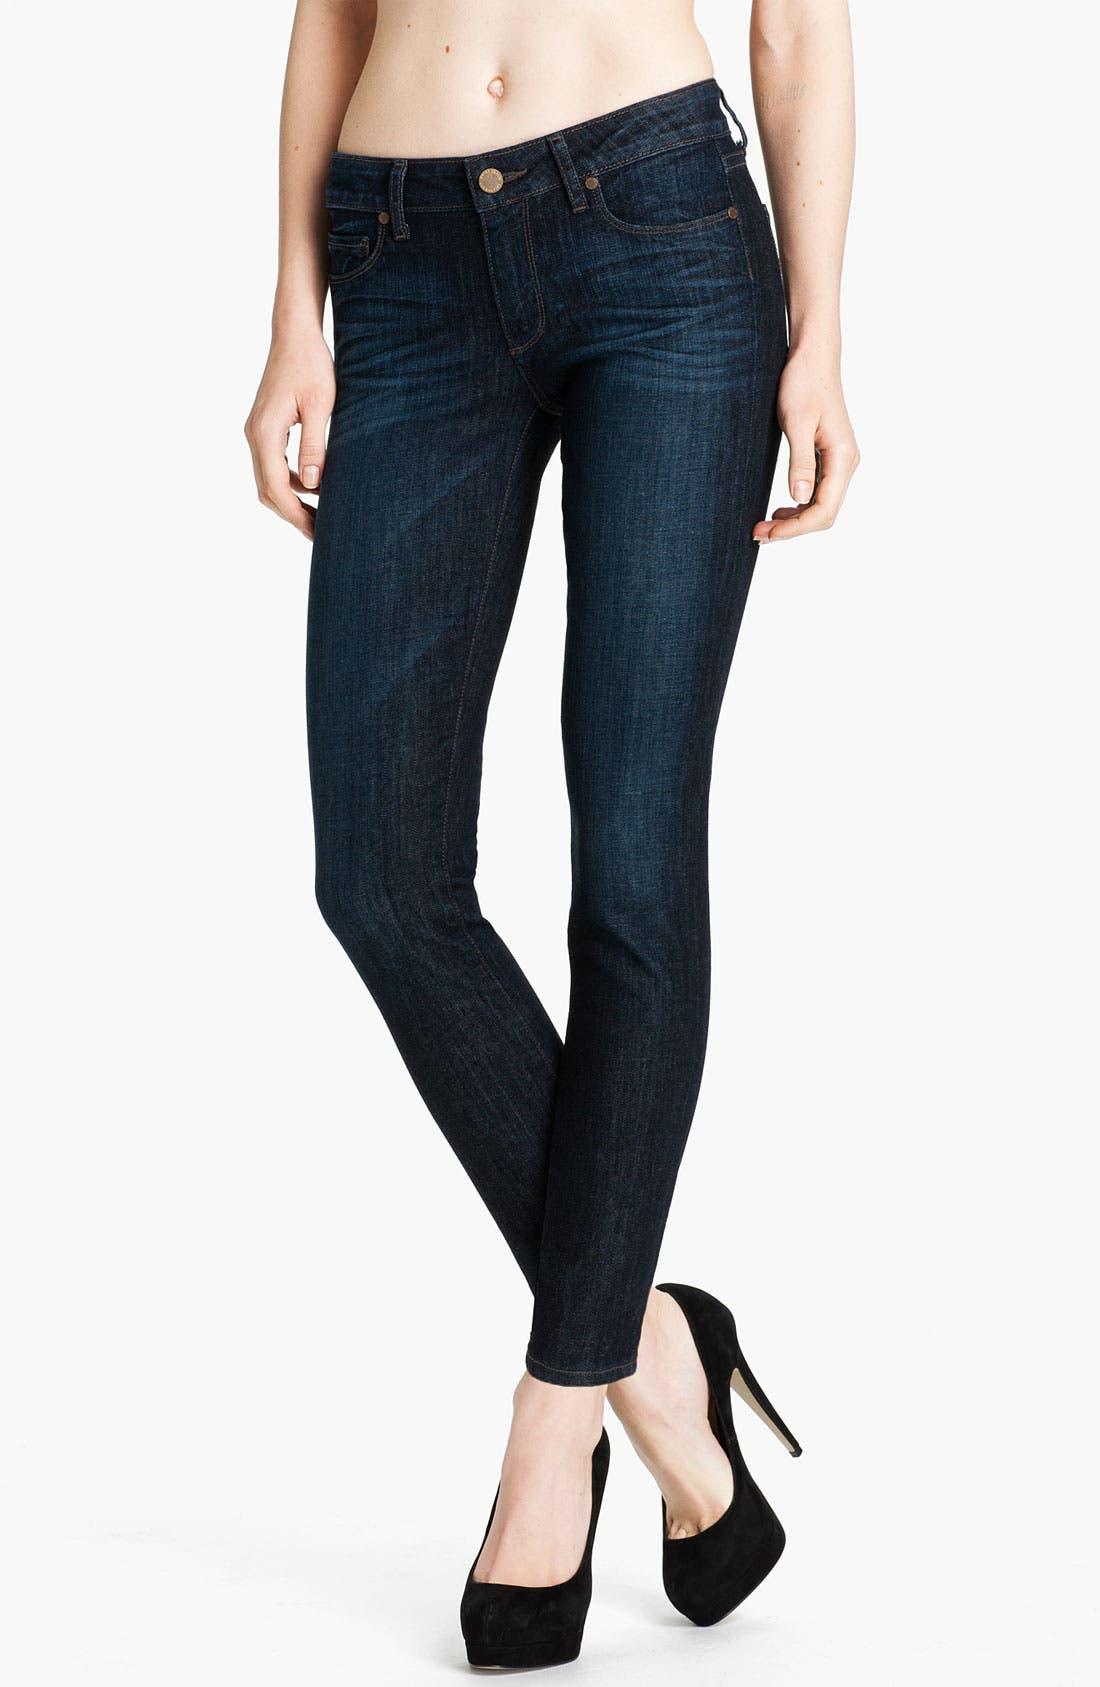 Main Image - Paige Denim 'Skyline' Ankle Peg Skinny Stretch Jeans (Hartley)